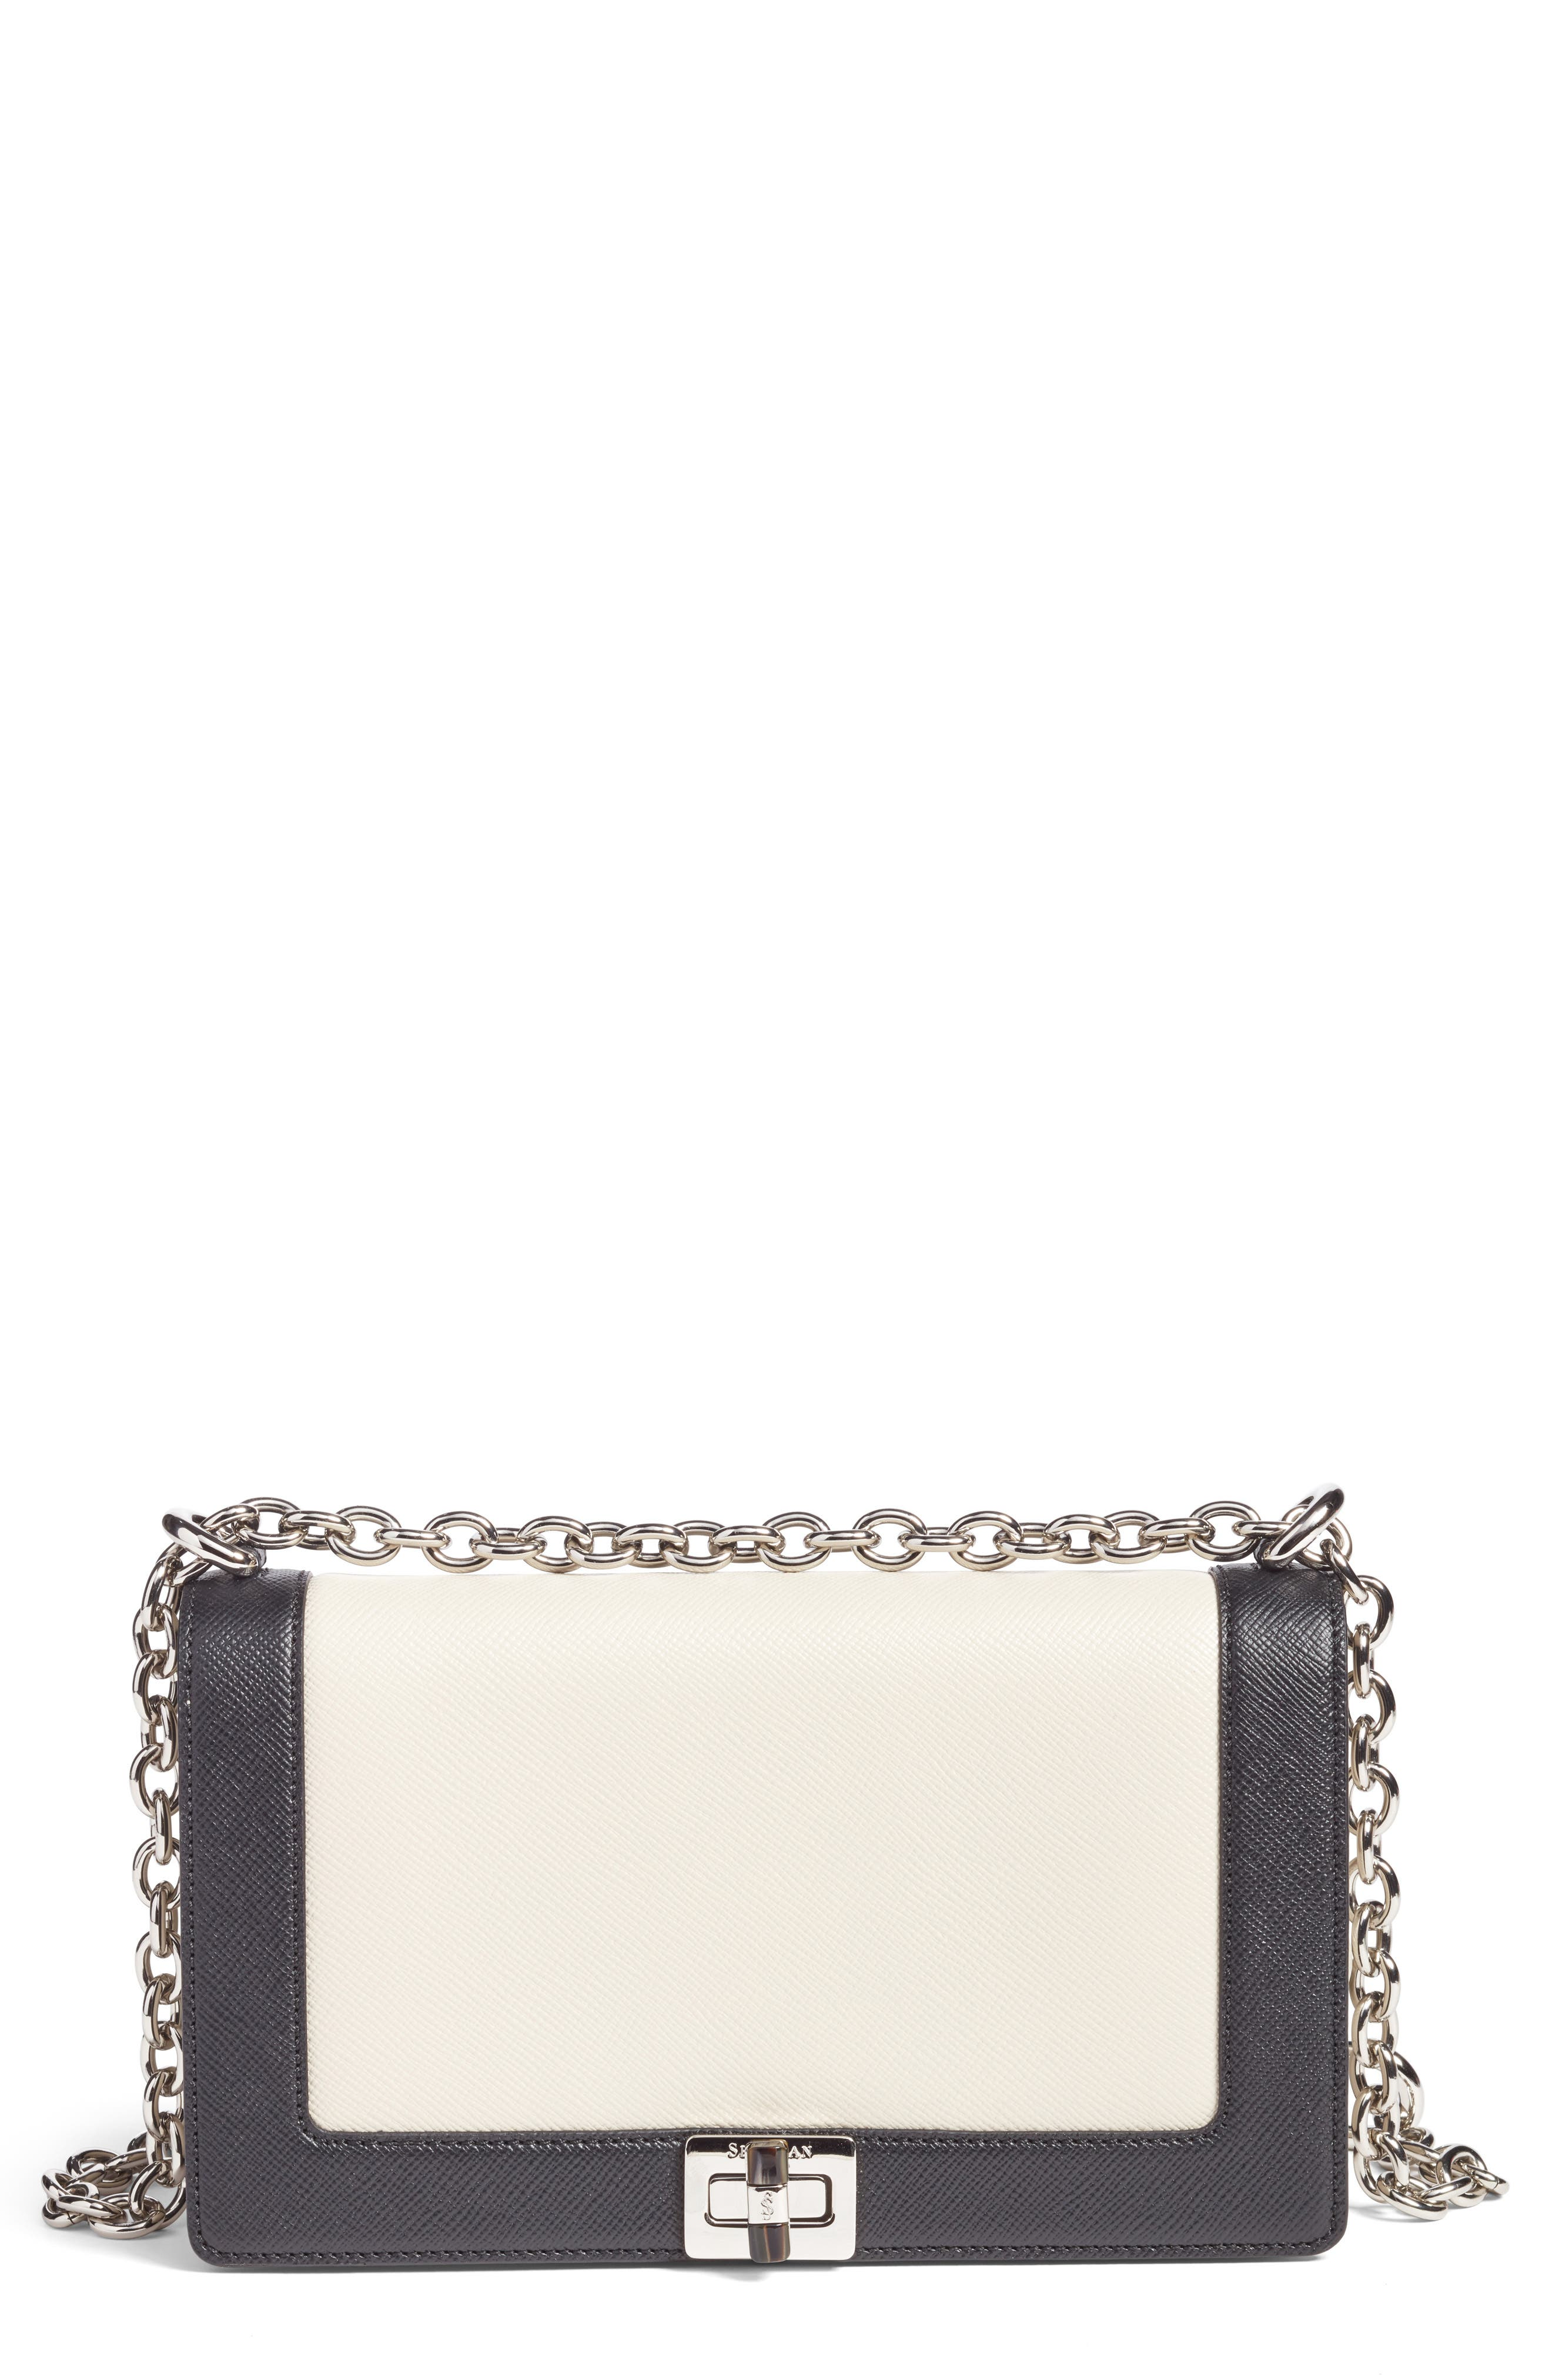 Main Image - Serapian Milano Roberta Evolution Leather Crossbody Bag